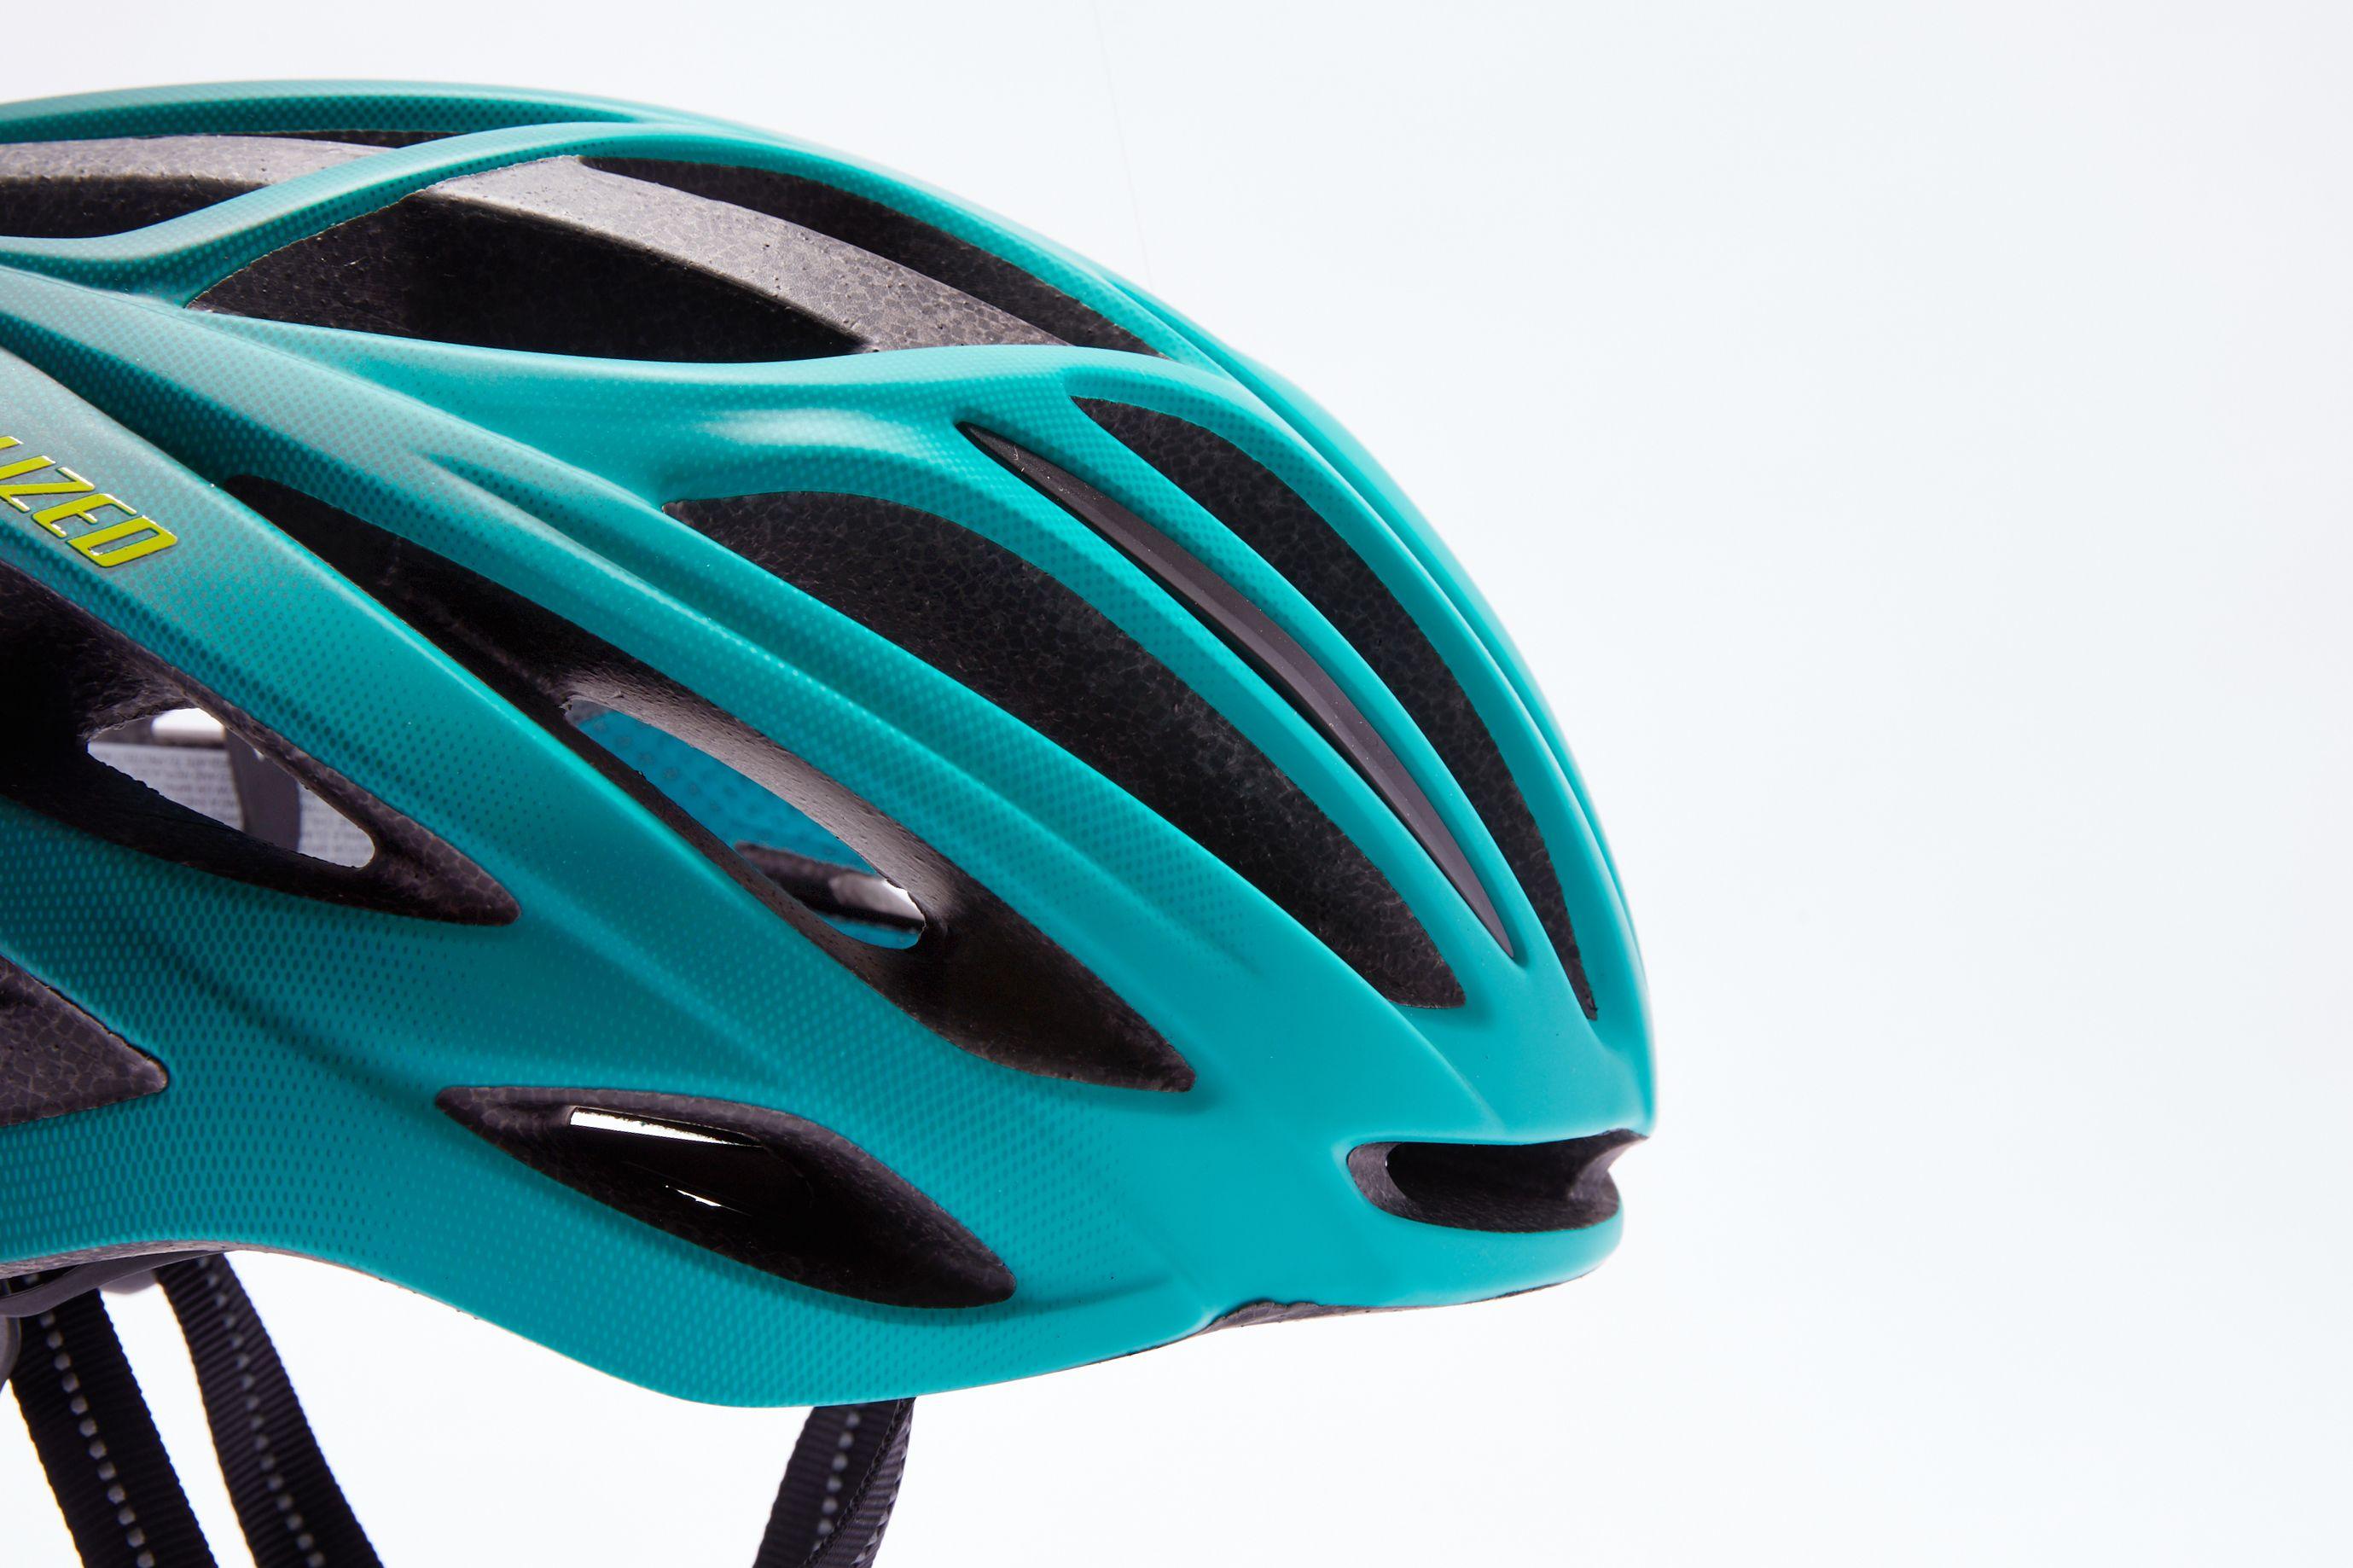 c07a0f8a4e4 Specialized Echelon II Review - Cheap Road Helmet